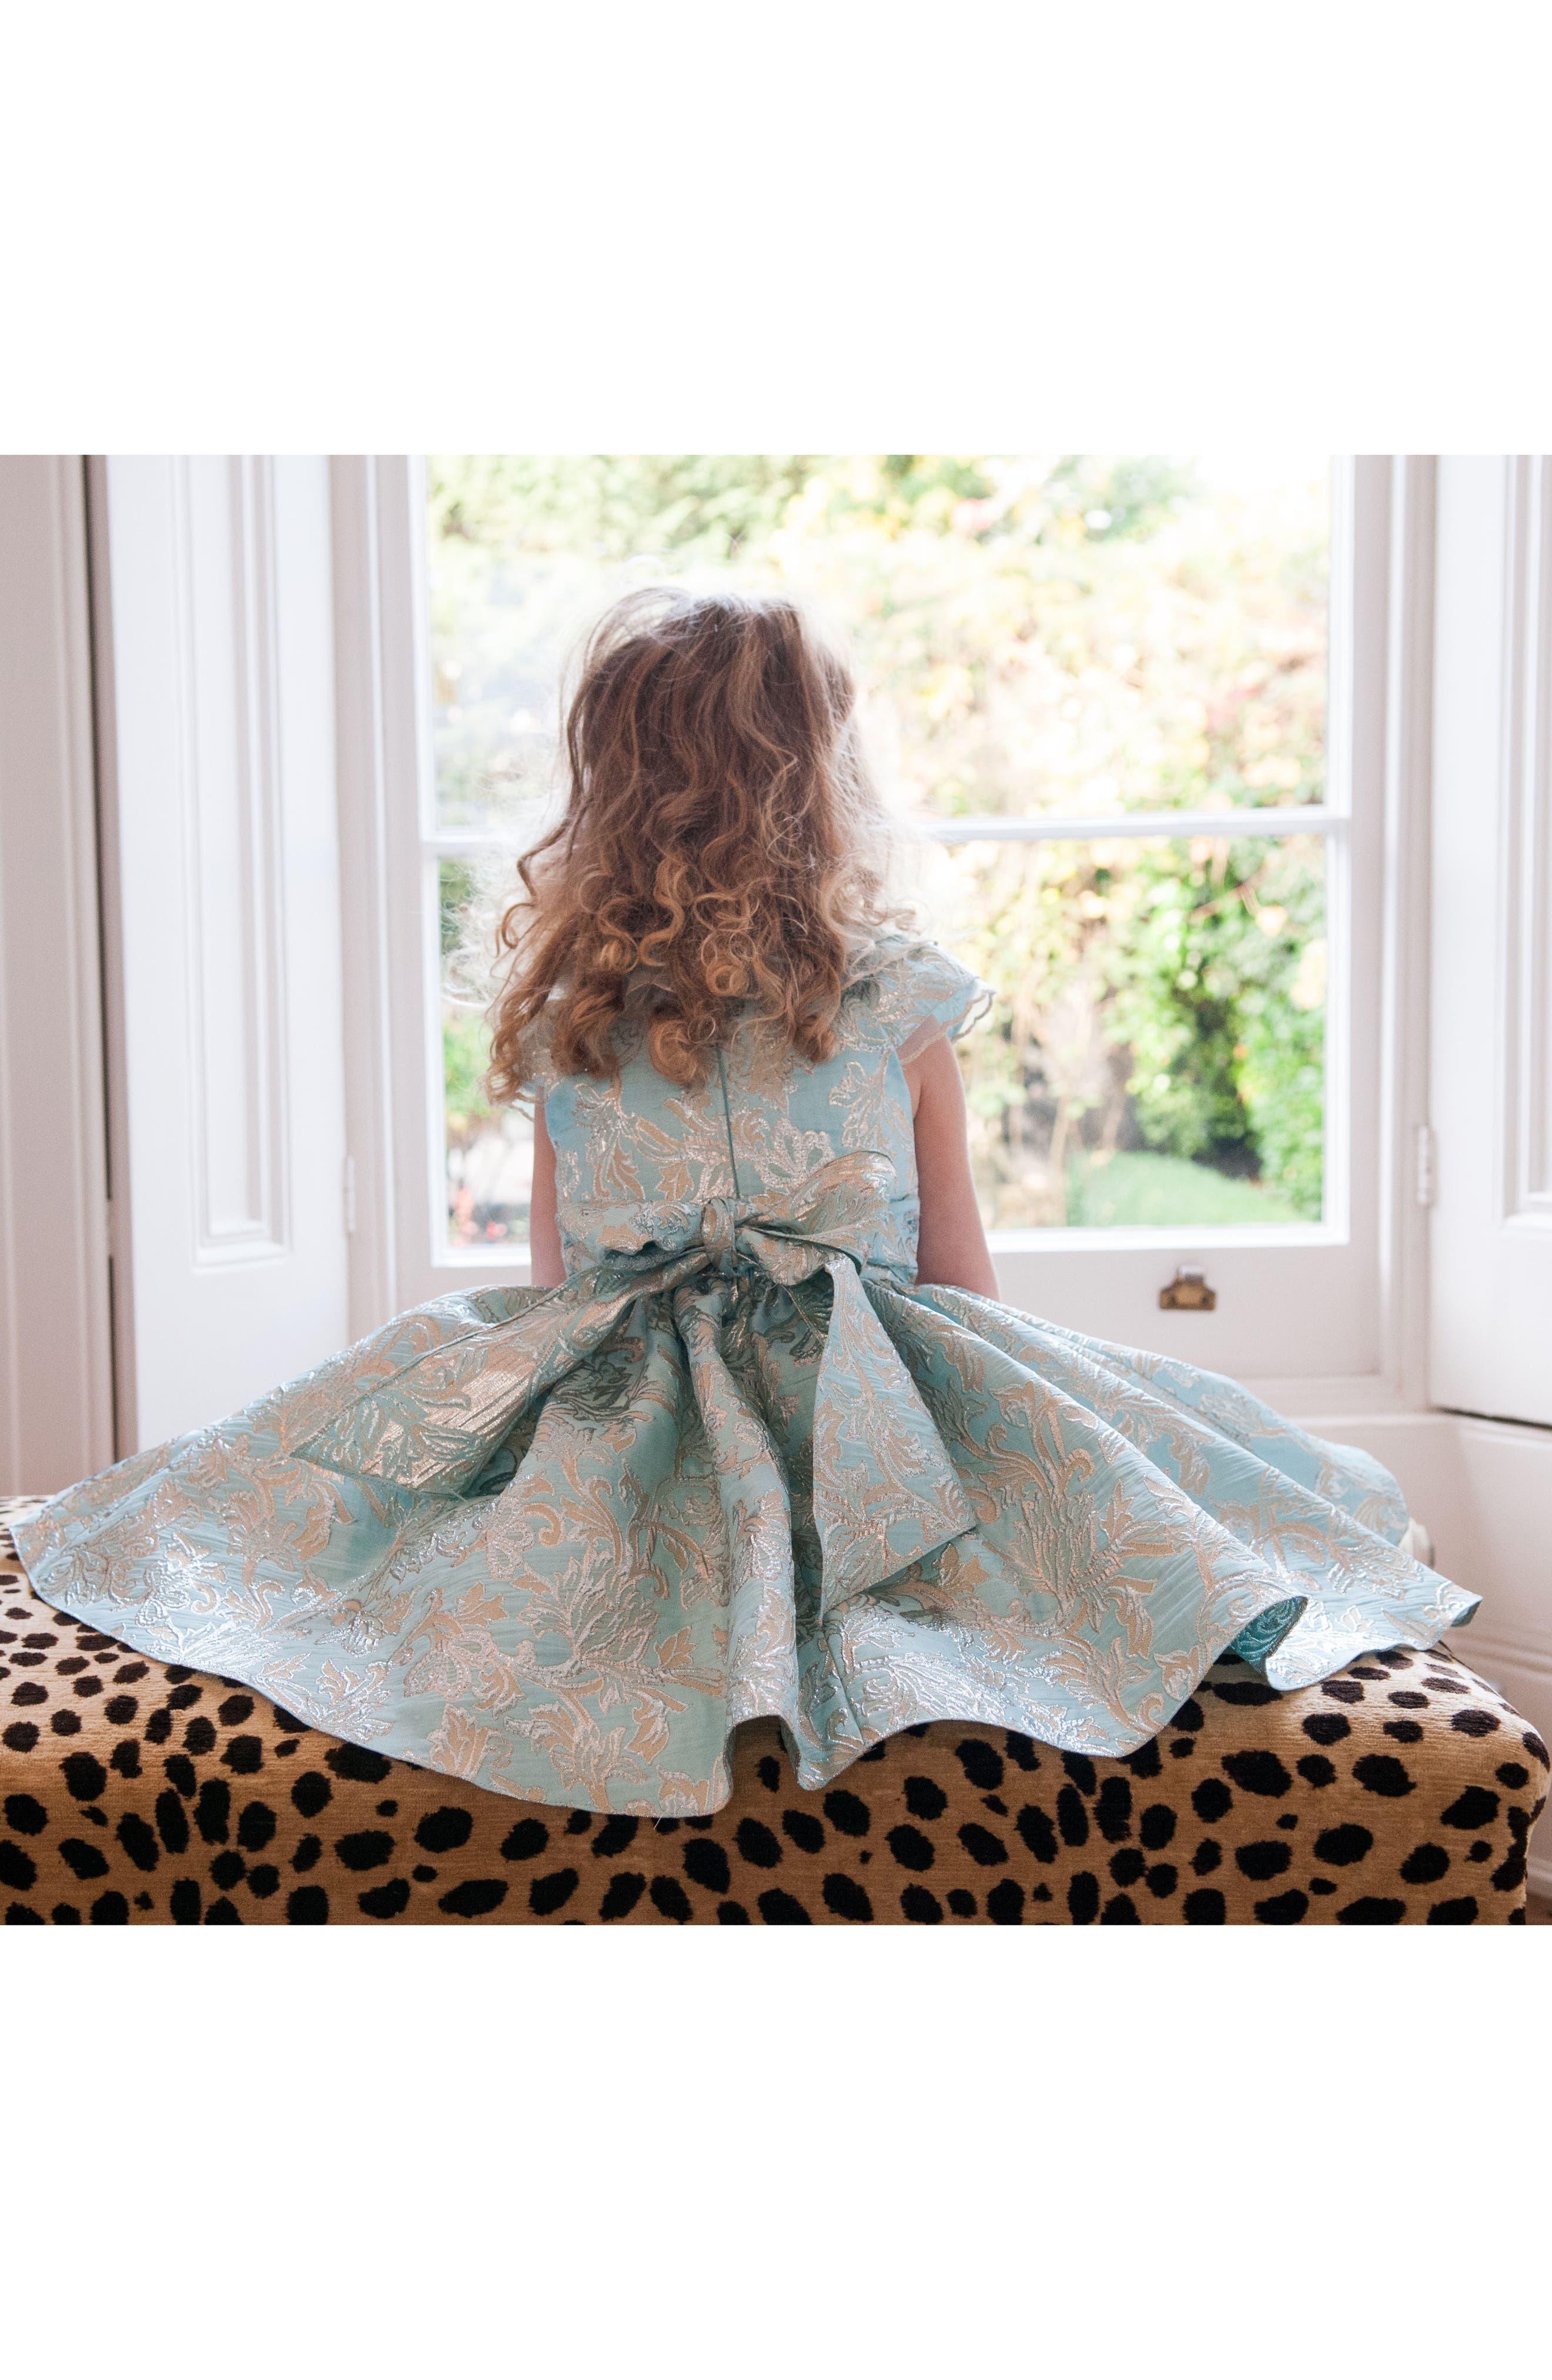 Alternate Image 3  - David Chales Ruffle Neck Brocade Dress (Toddler Girls & Little Girls)